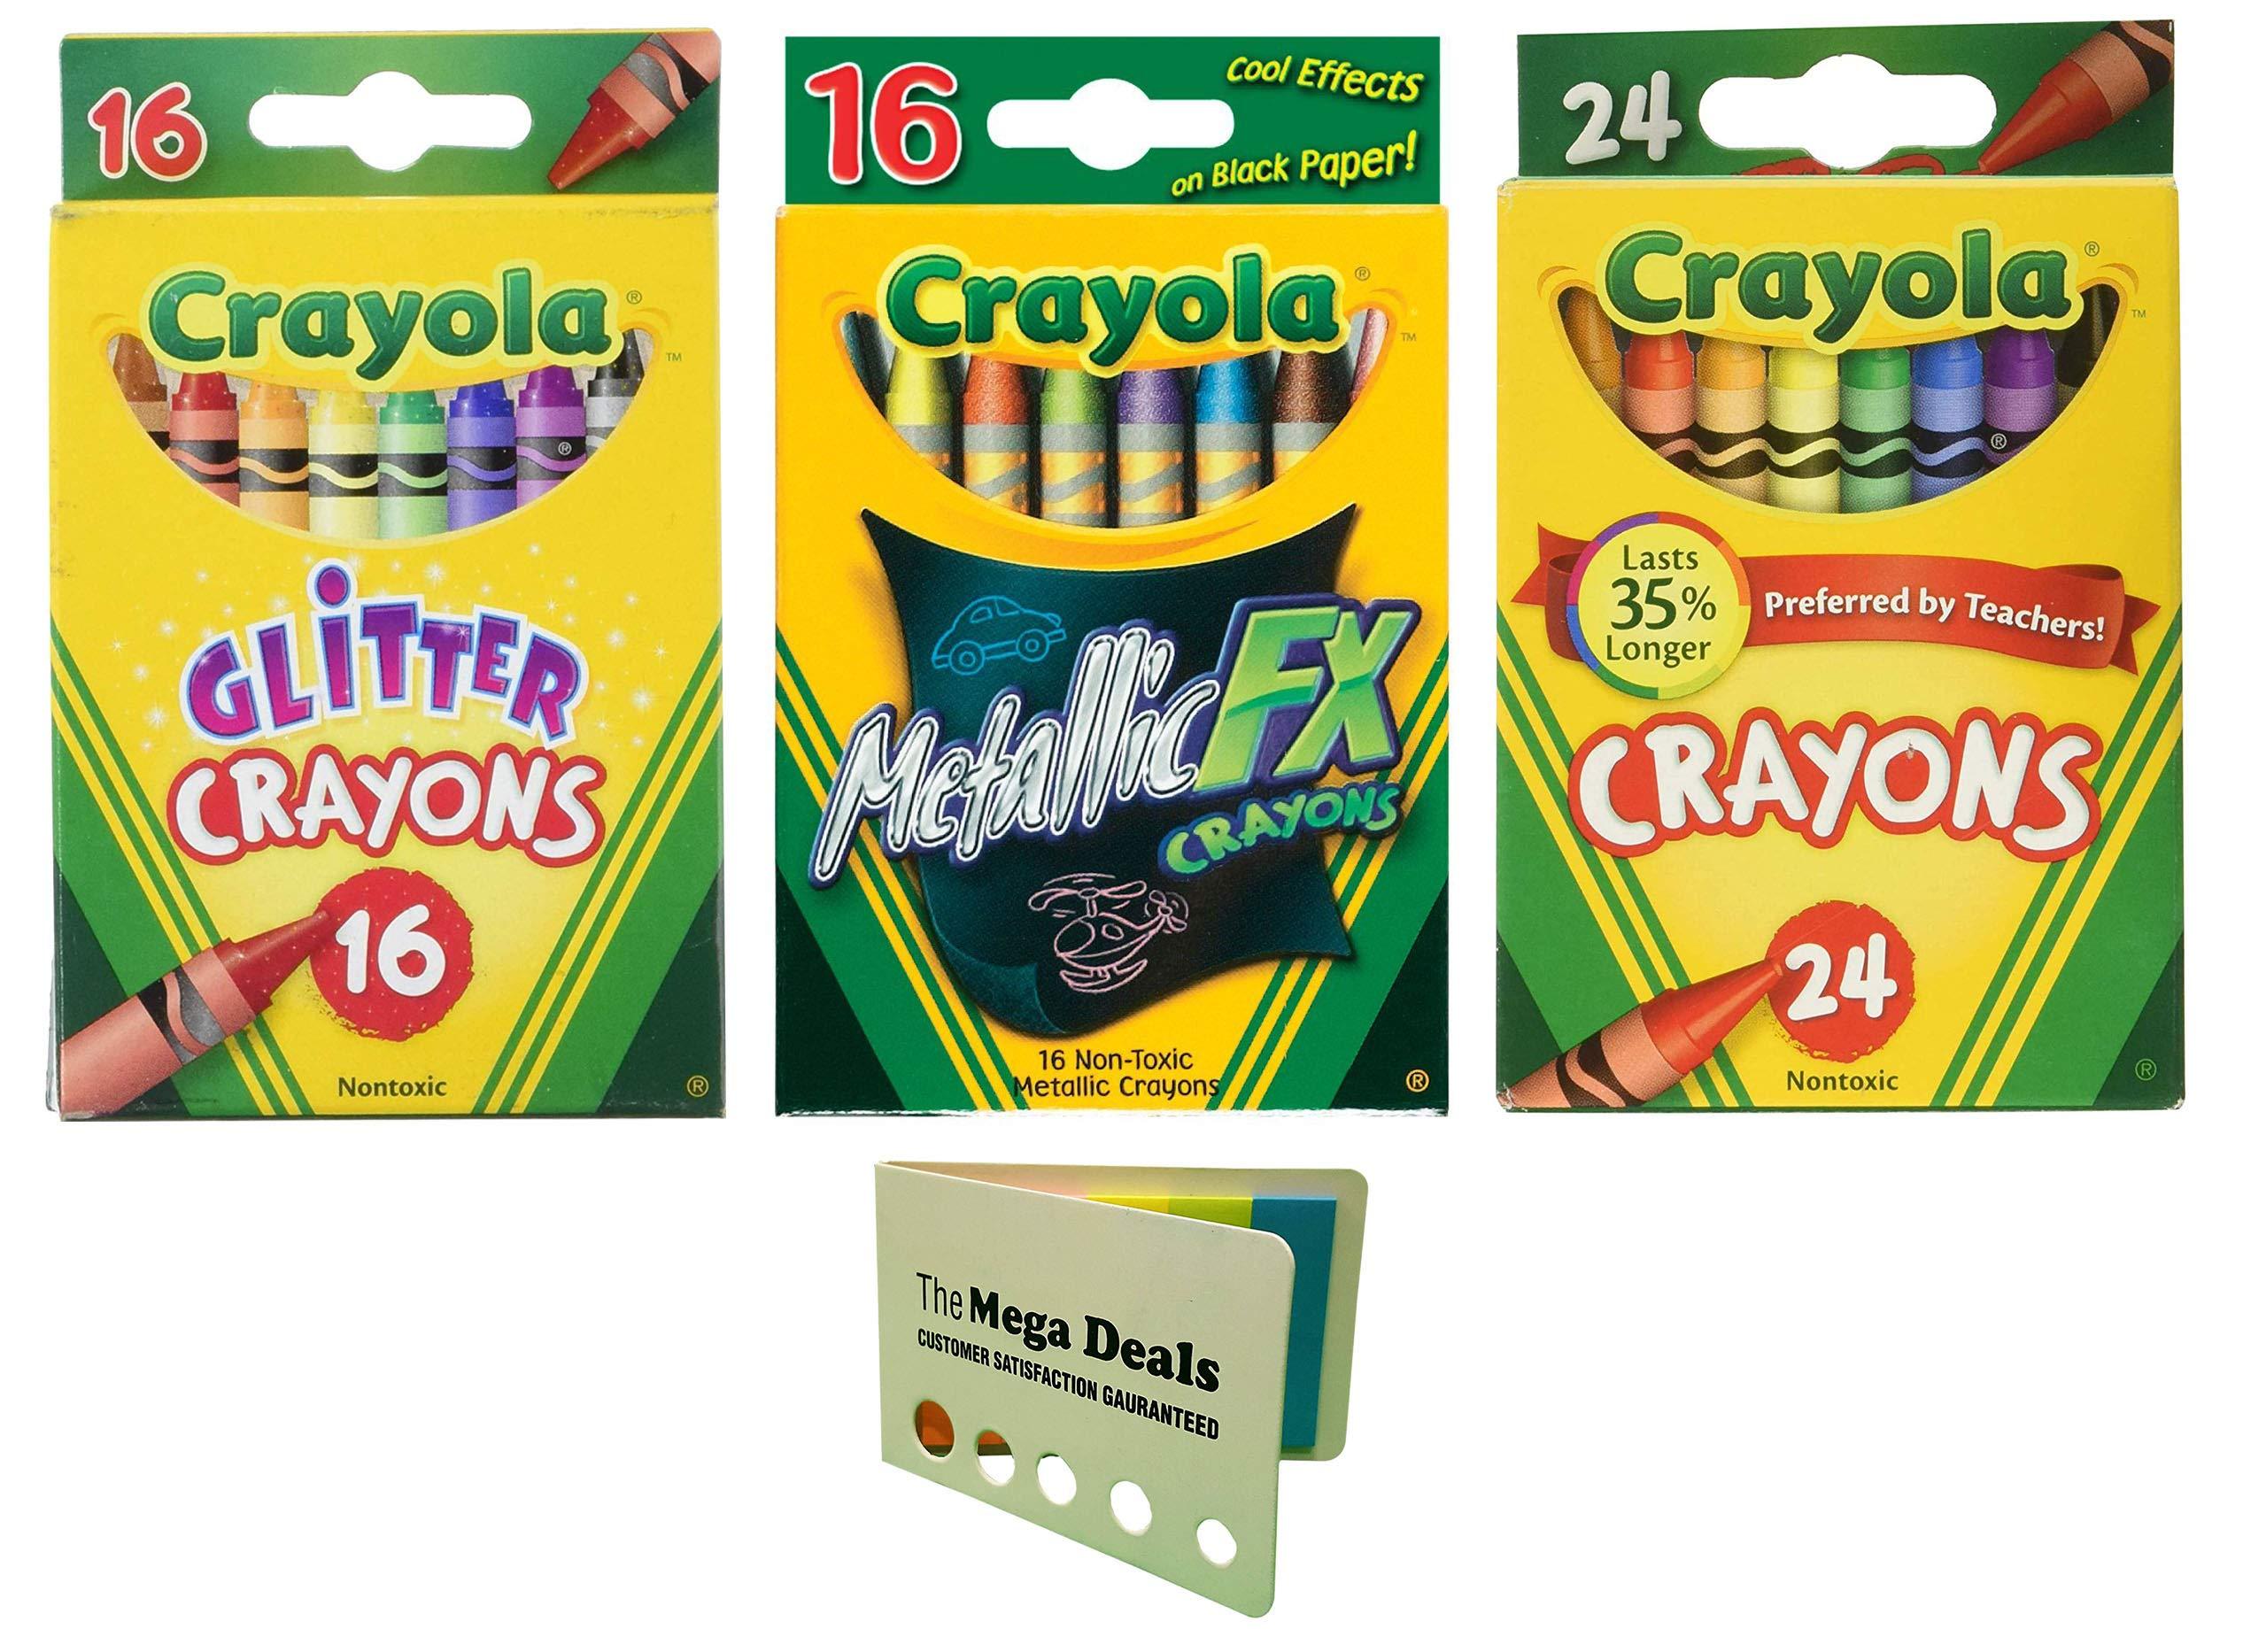 Crayola Glitter Crayons, 16 Count | Metallic FX Crayons, 16 Count | Crayons, 24 Count | Includes 5 Color Flag Set